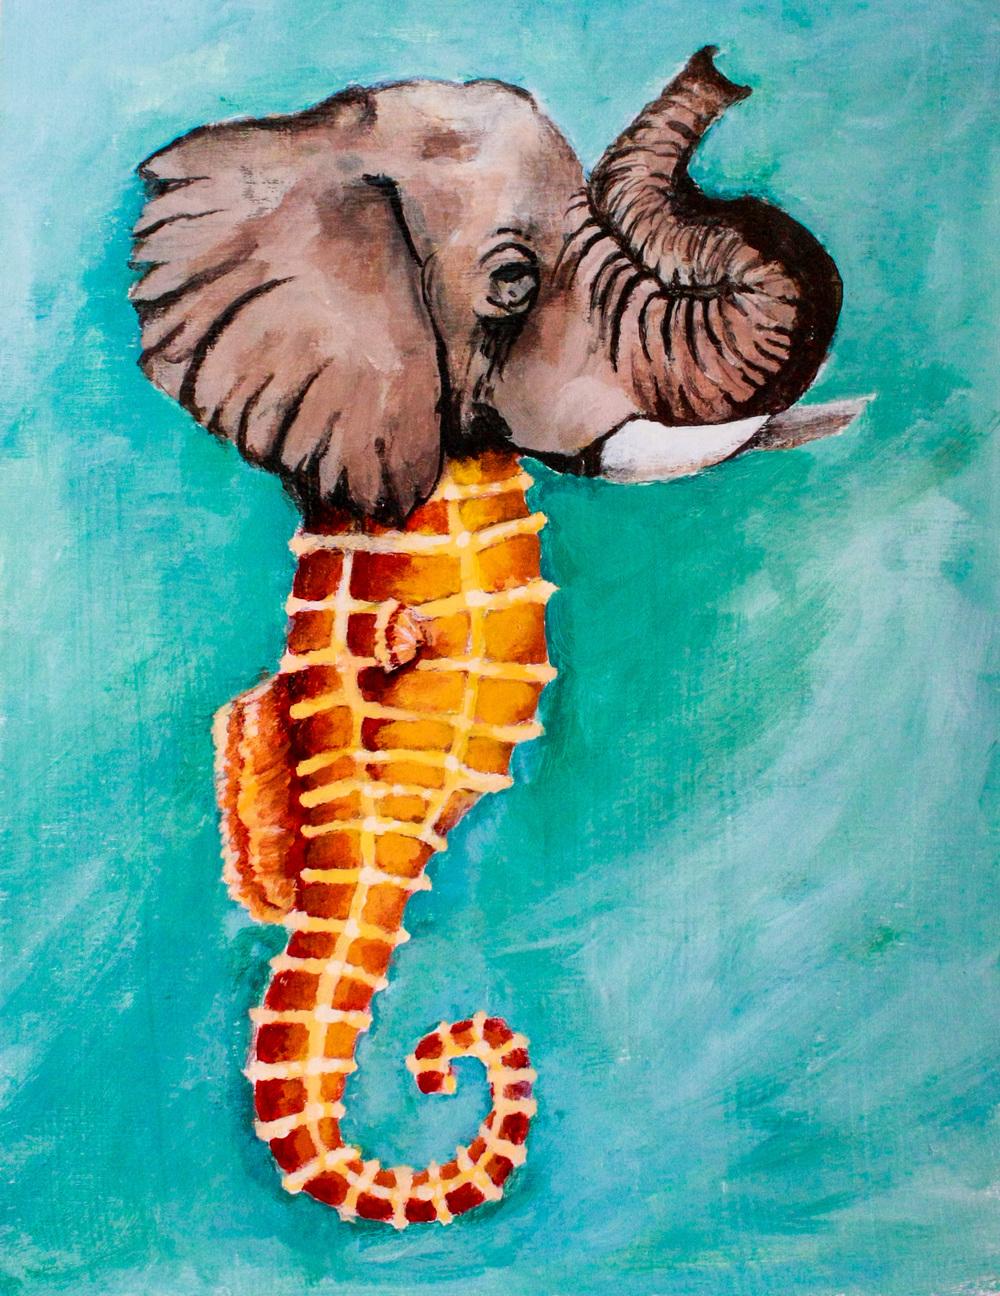 Elephantseahorse-1-of-1_1500.jpg